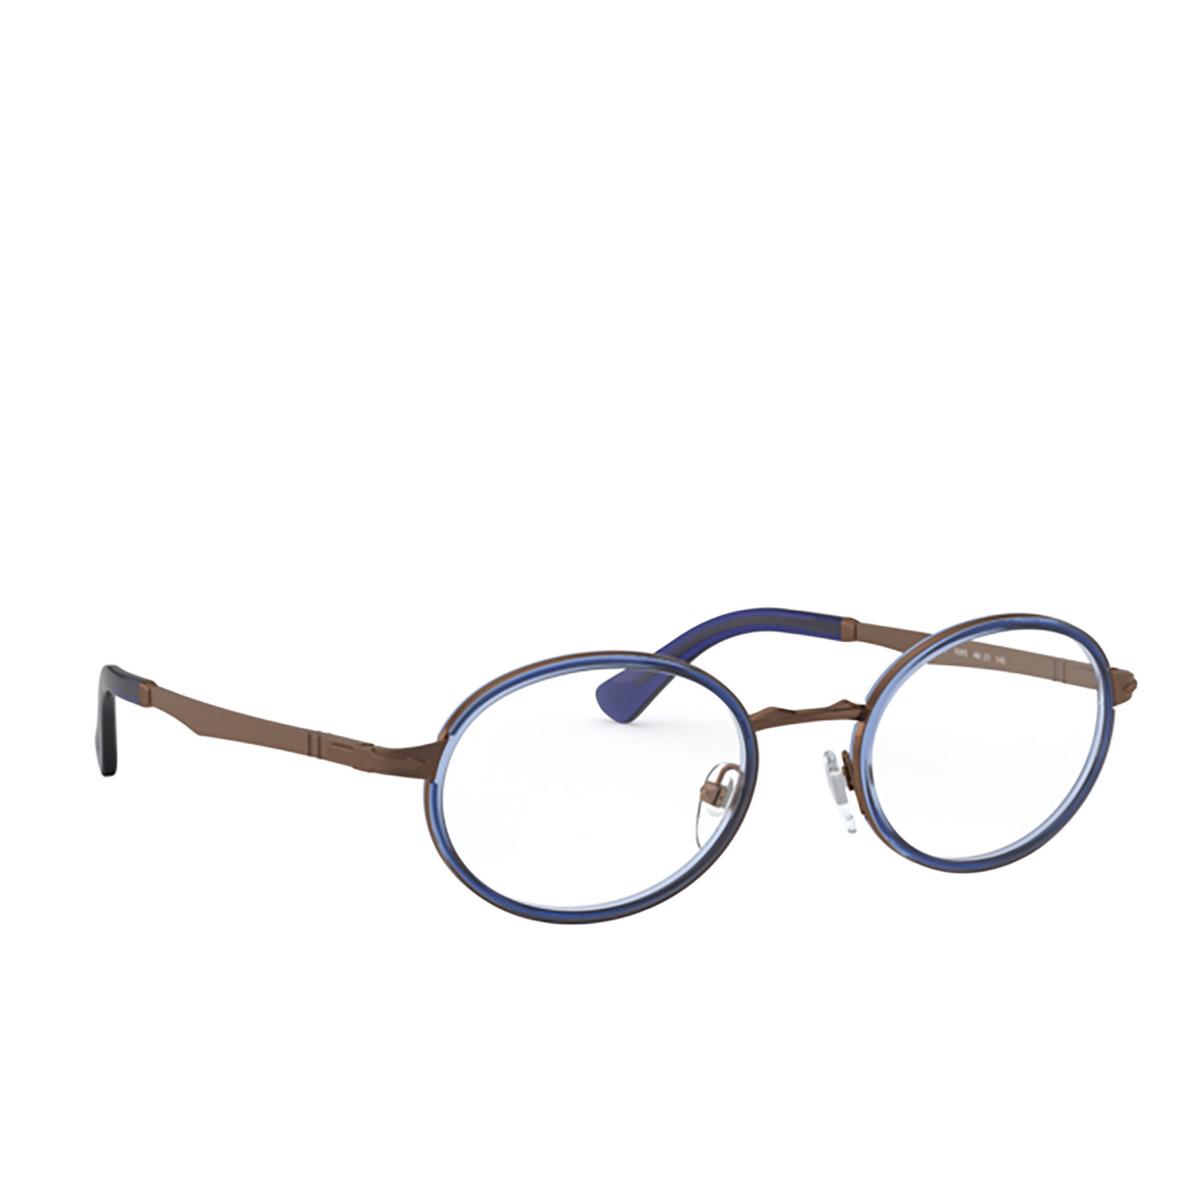 Persol® Oval Eyeglasses: PO2452V color Brown & Blue 1095 - three-quarters view.